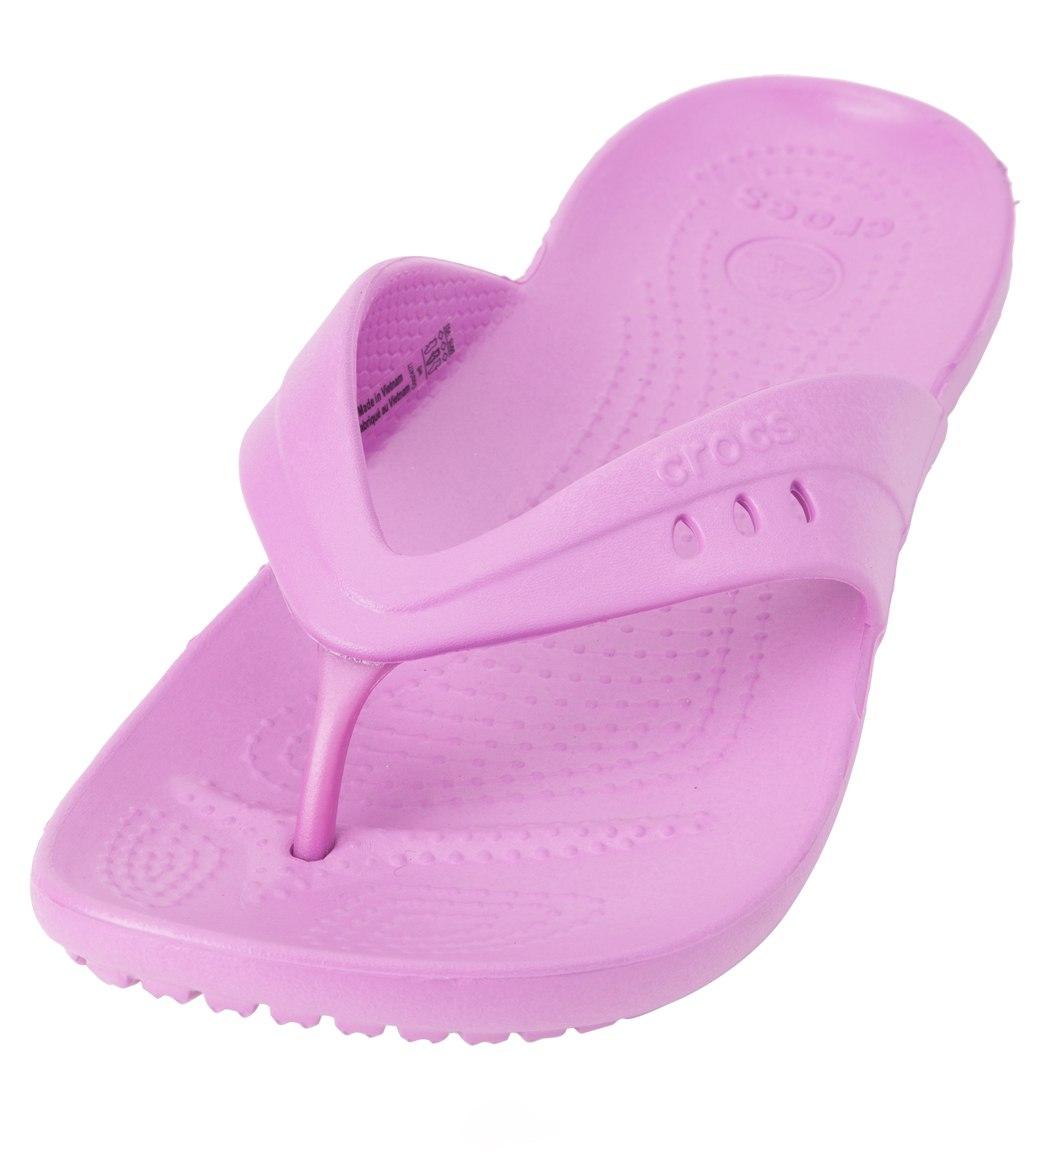 fcdab7fd6 ... Crocs Women s Kadee Flip Flop. Share